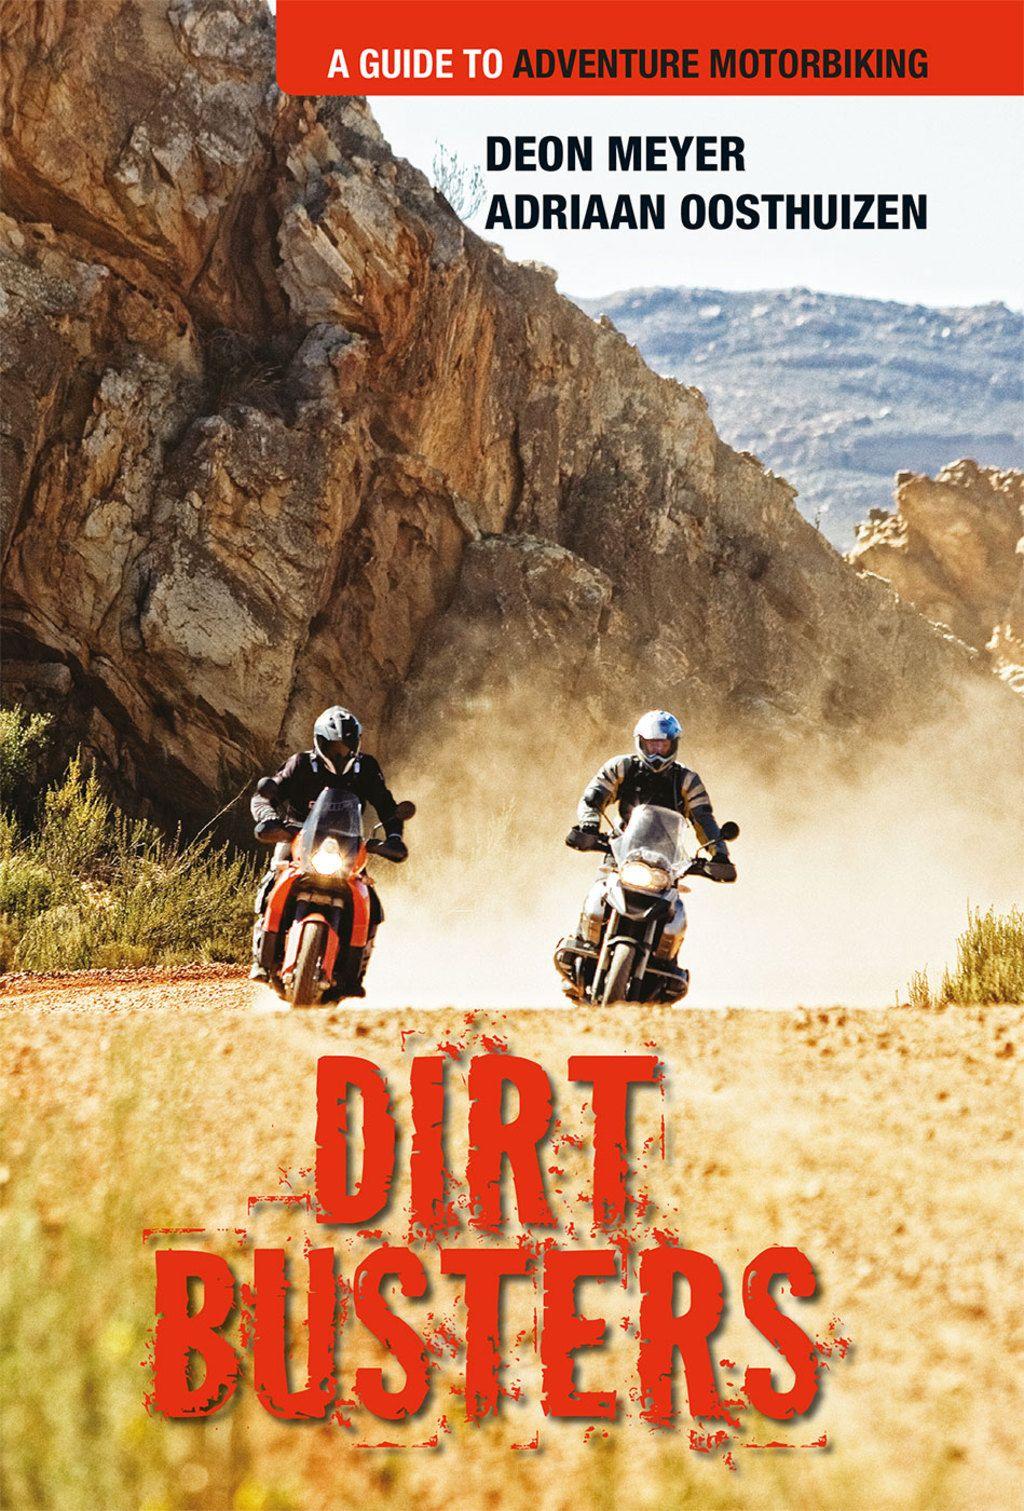 Dirt busters ebook adventure this book road trip